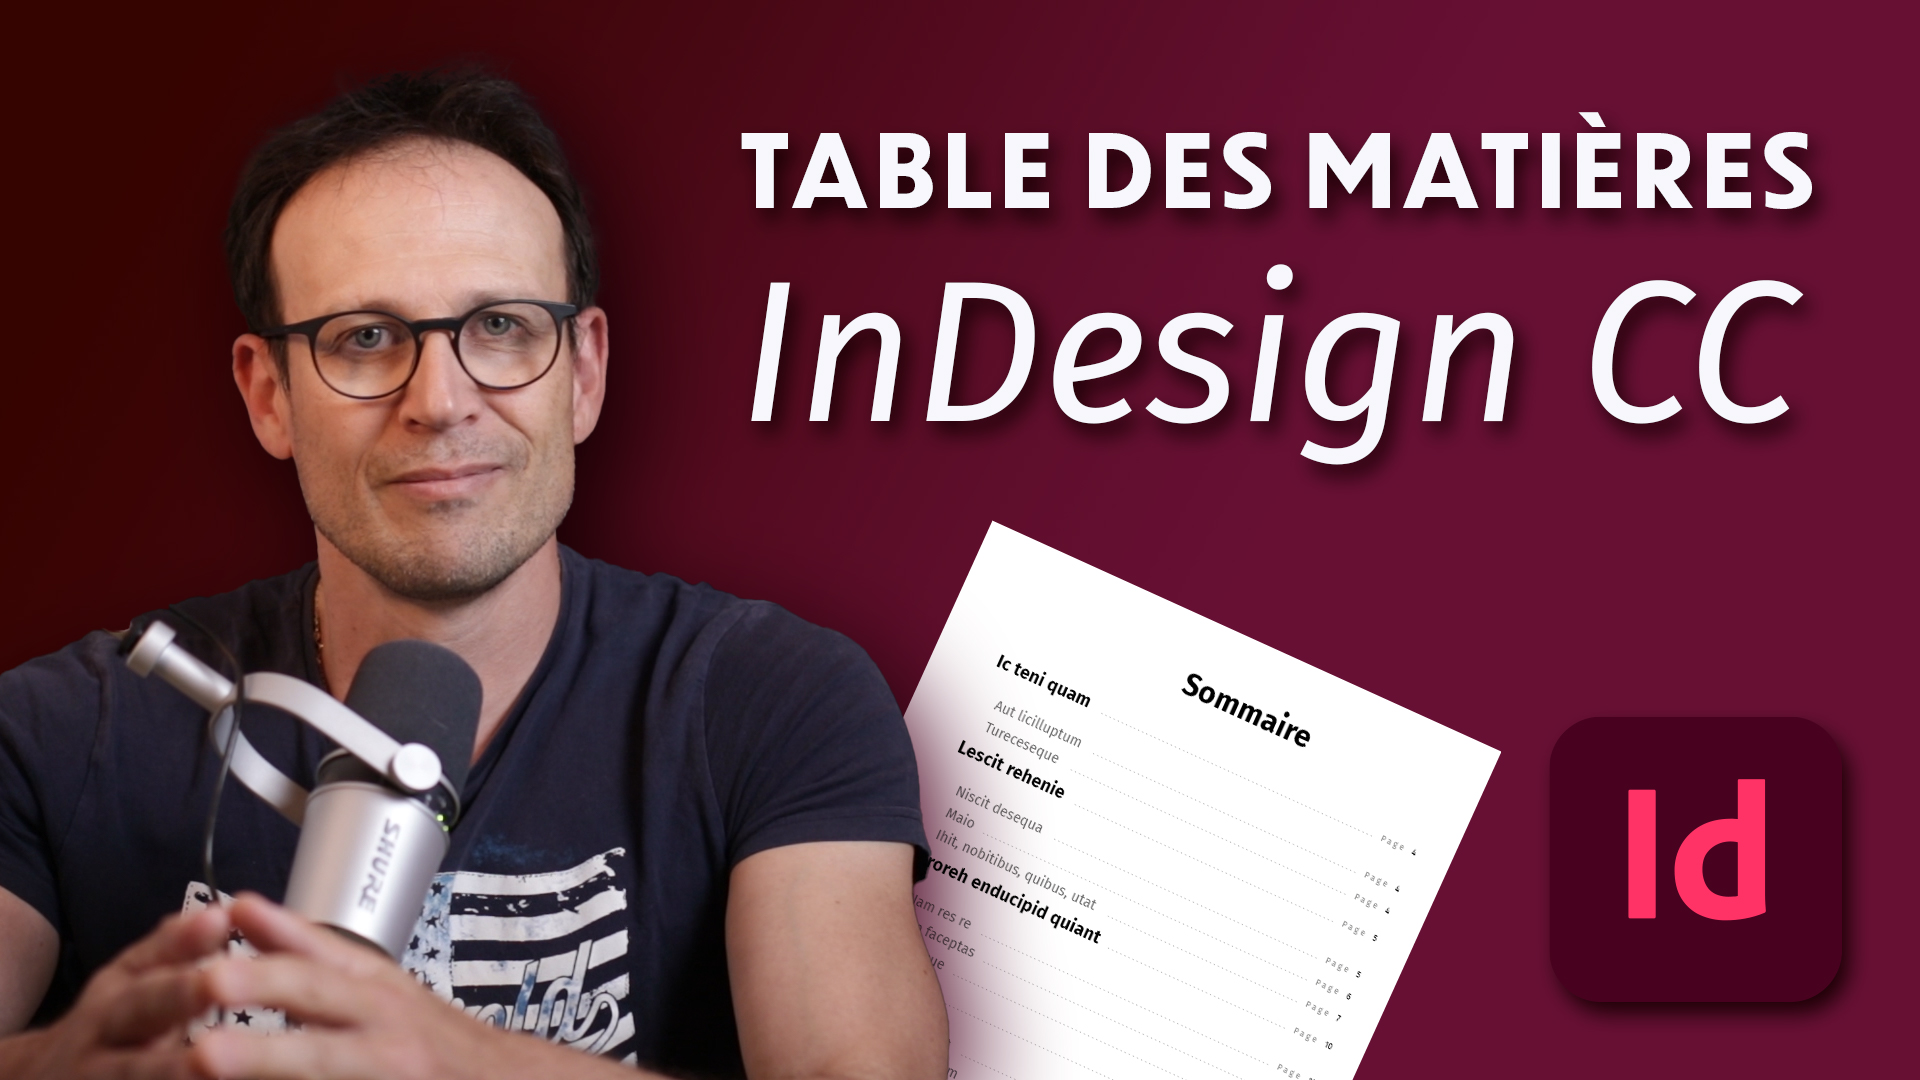 Table des matières Indesign